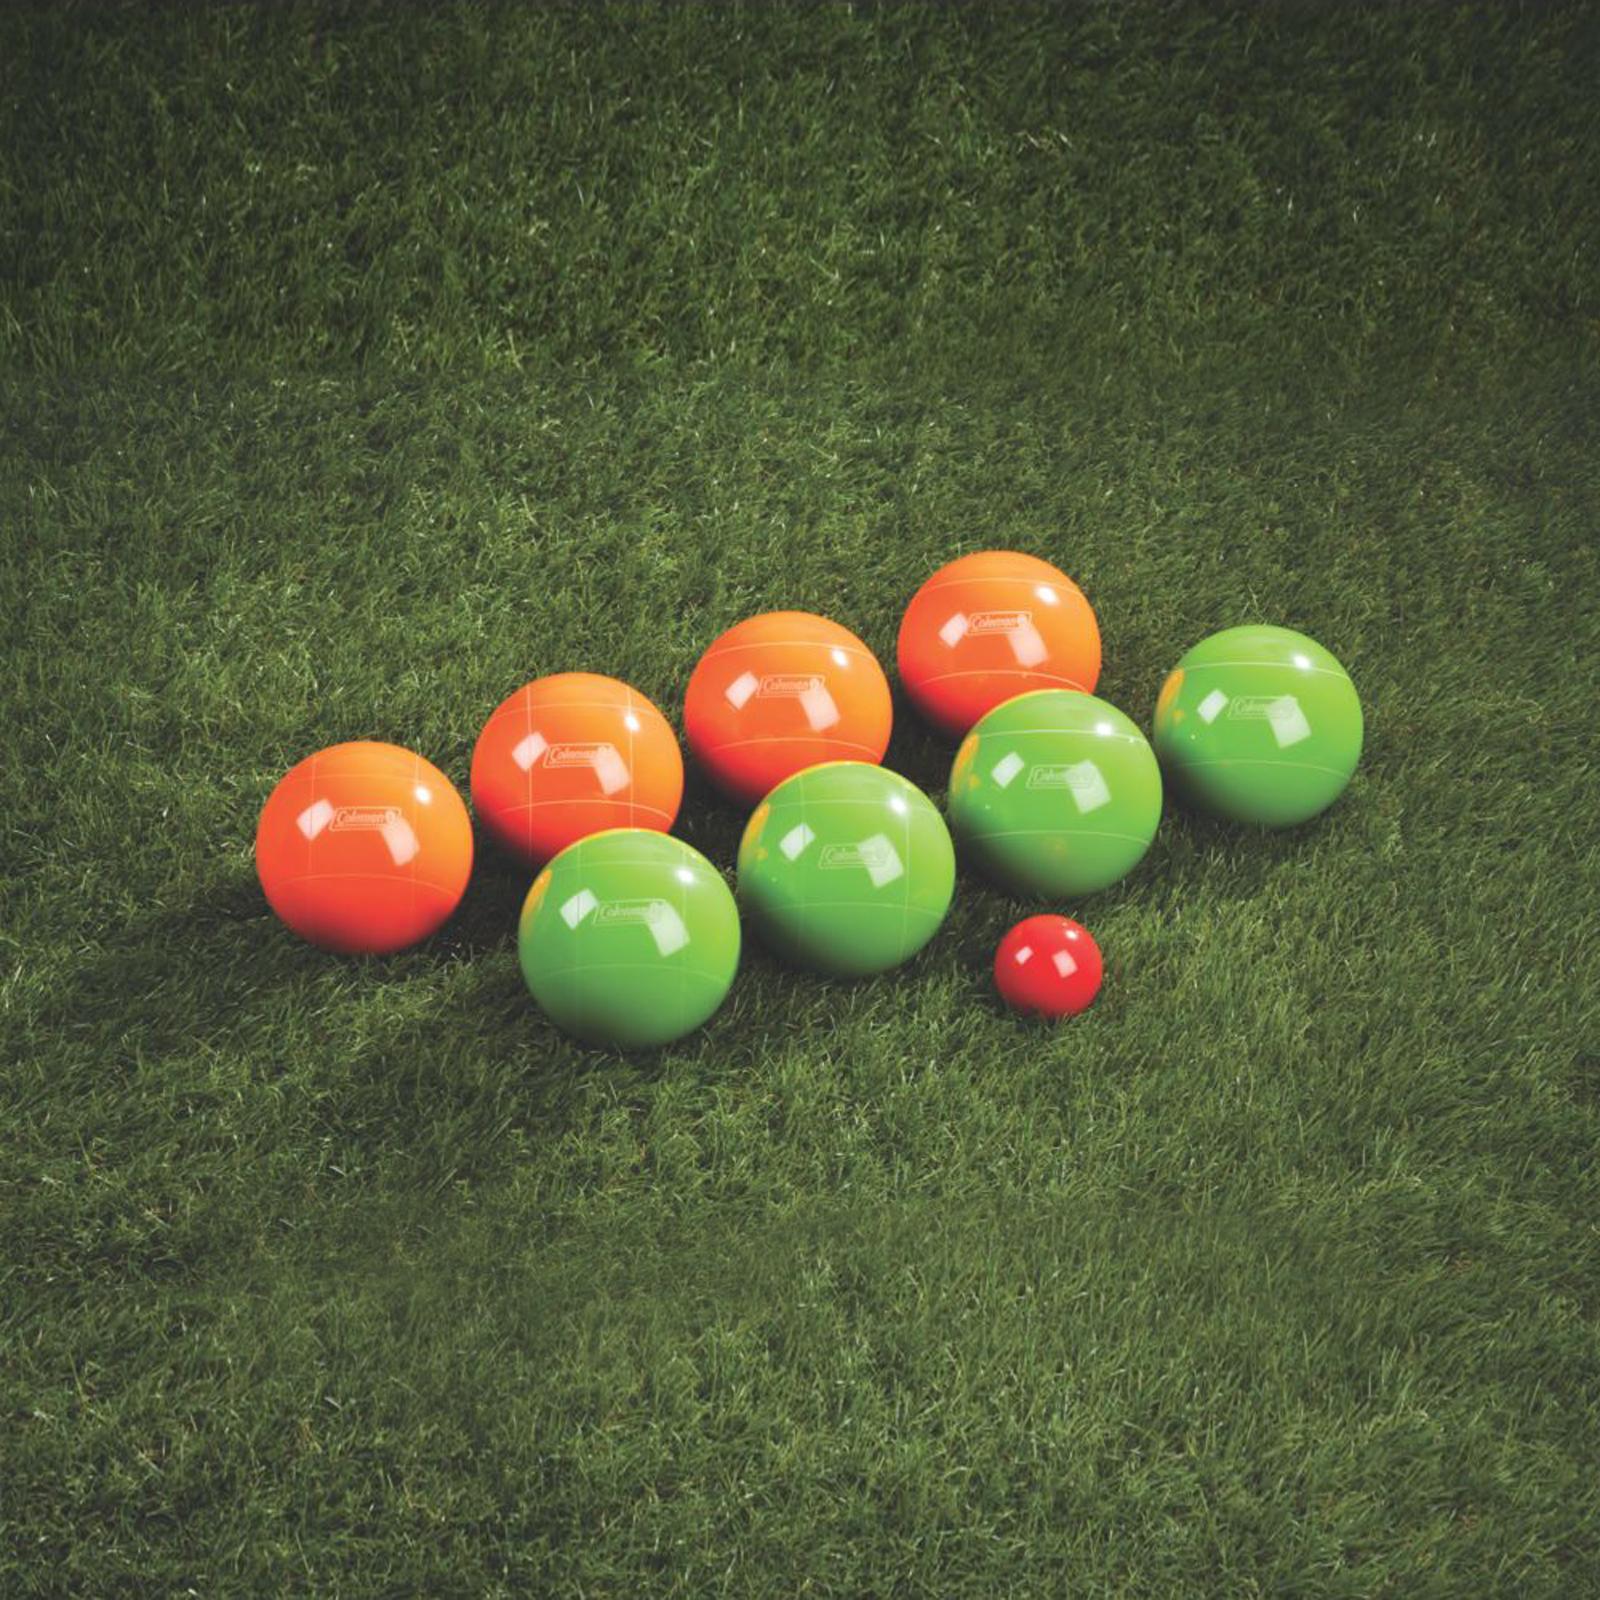 coleman bocce ball set